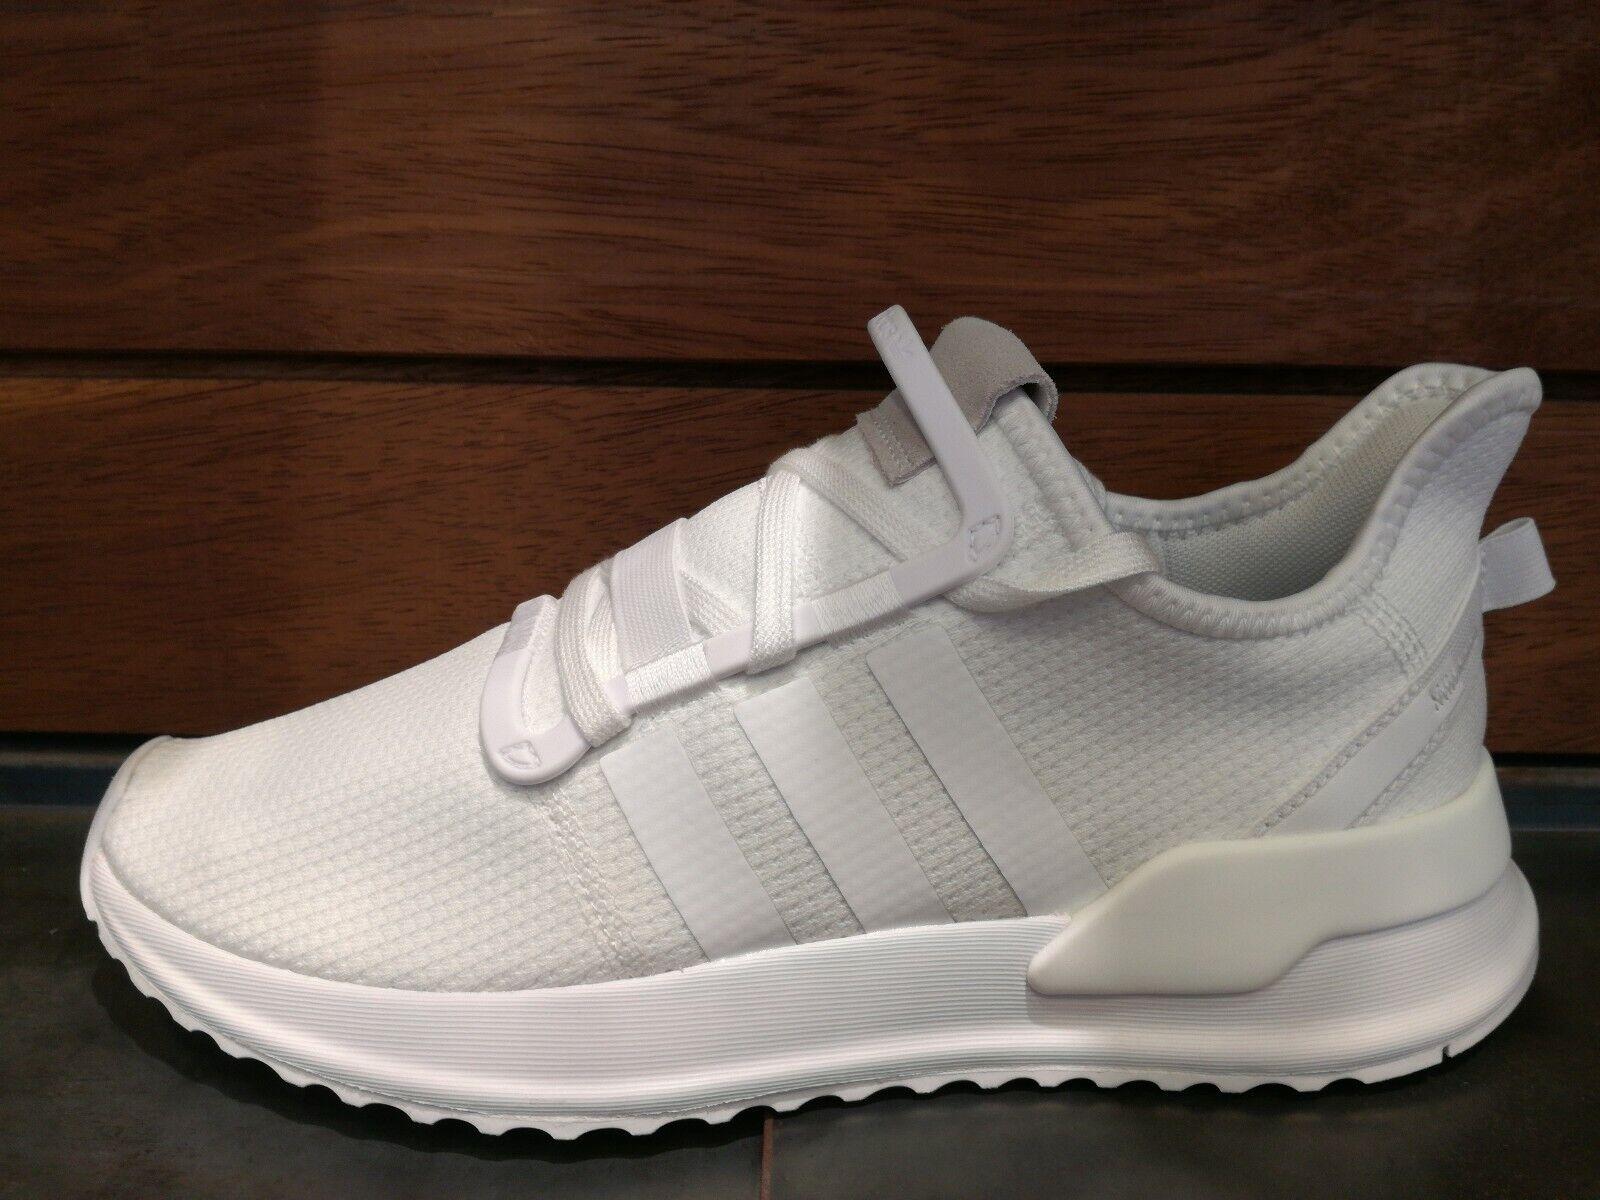 Adidas U_Path Run Originali G27637 Numero 43 1 3 Eur ( 9,5 Us )